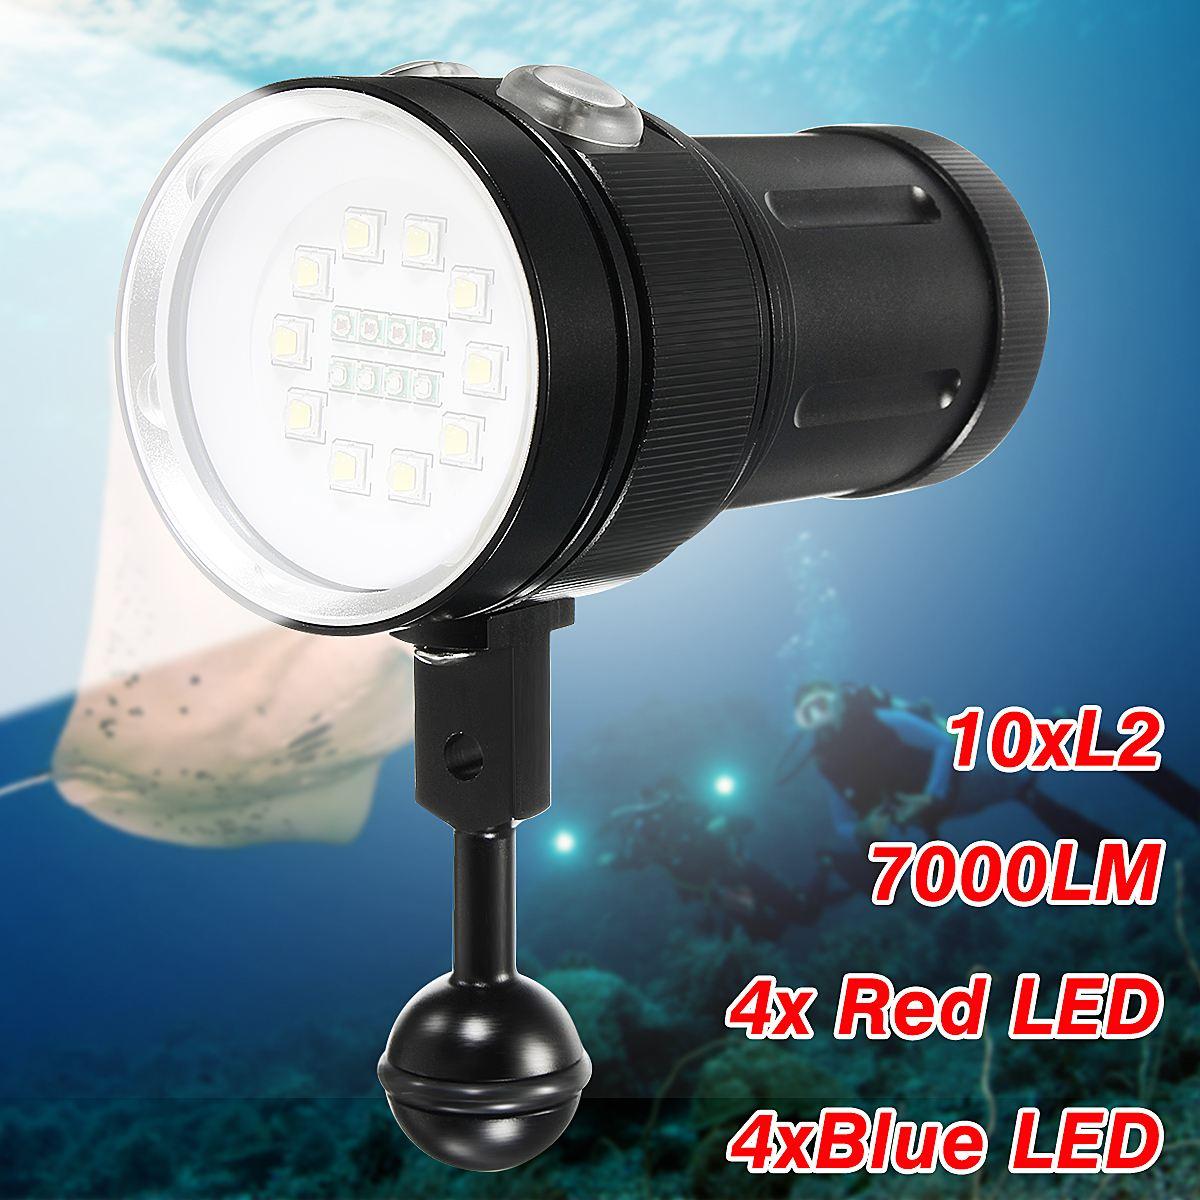 Smuxi 20000 LM Waterproof Diving 18650 Flashlight Protable Super Bright Underwater Torch For Diving Photographing Video зарядное устройство protable 5600mah 5v usb 18650 diy no